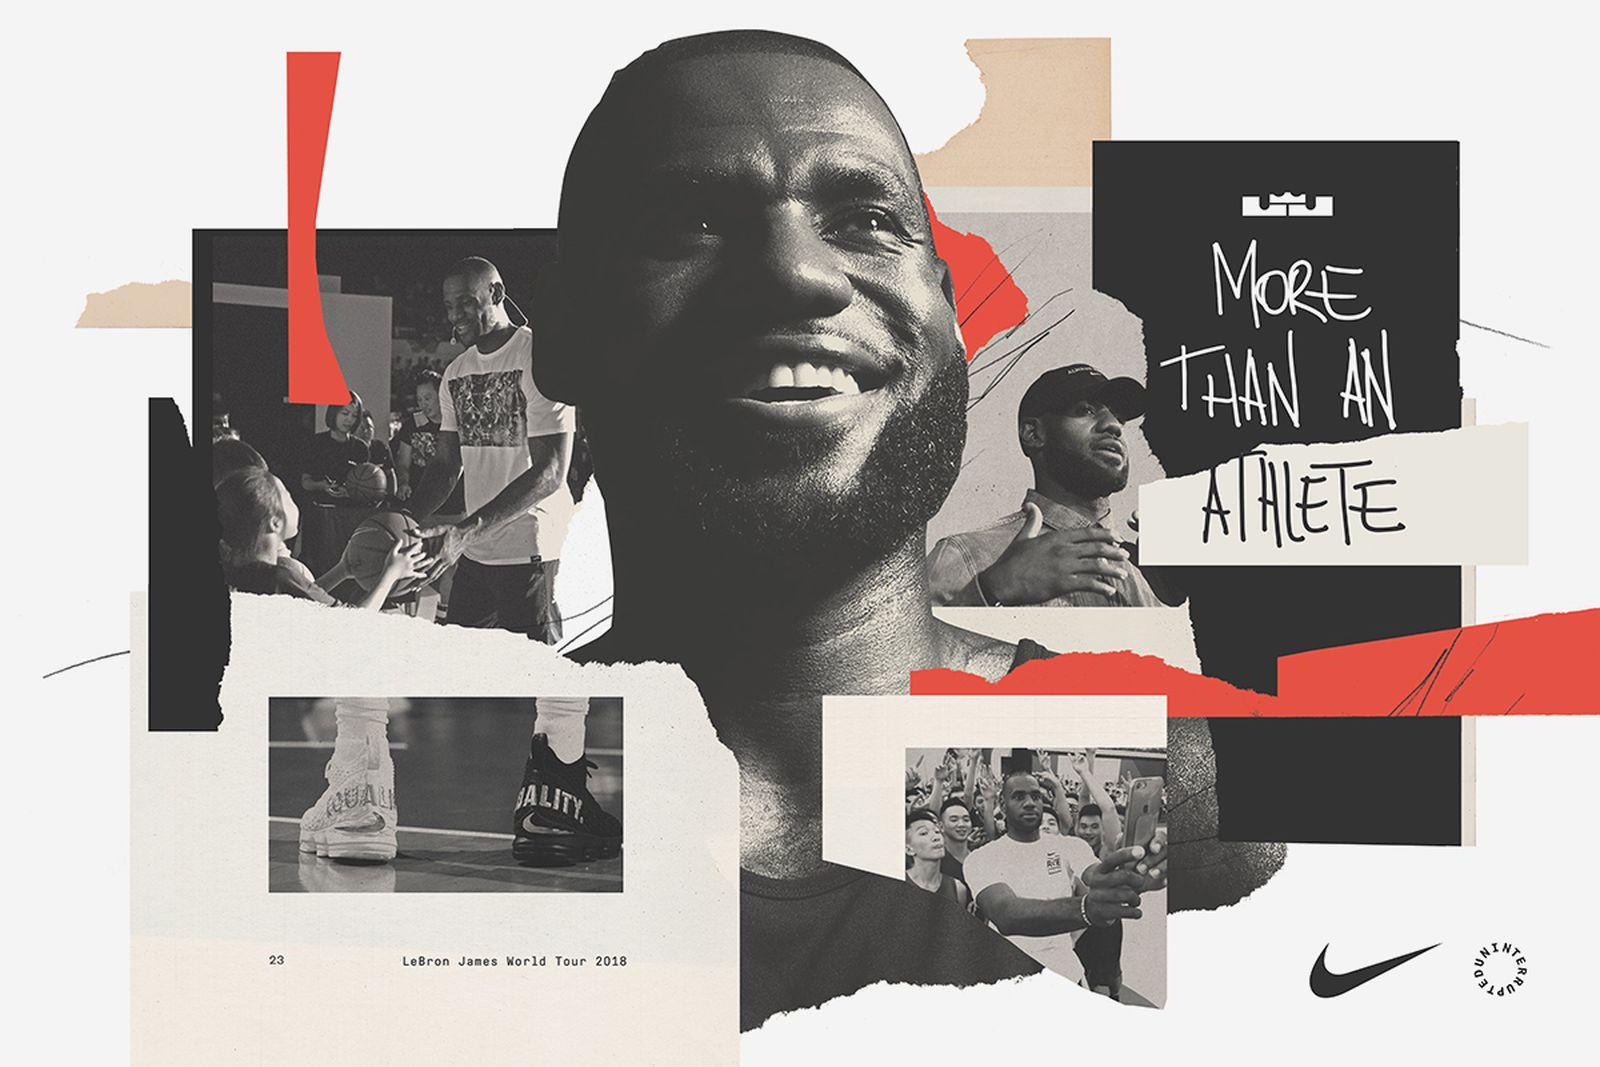 lebron james pick up games shanghai paris berlin Nike